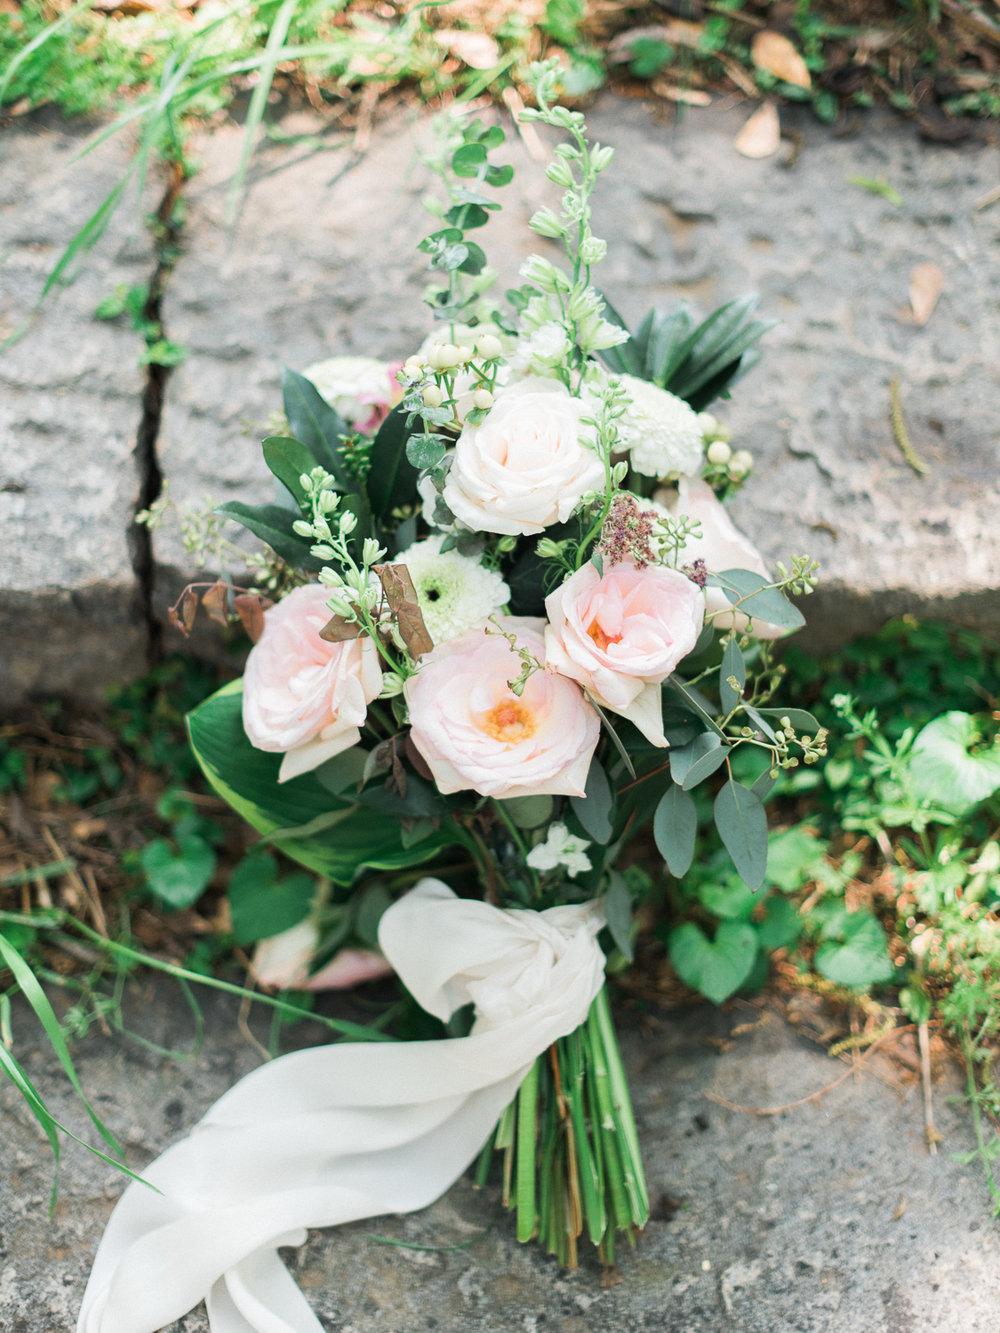 christinadavisphotography-romanticwedding-gardenweddinginspiration69.jpg